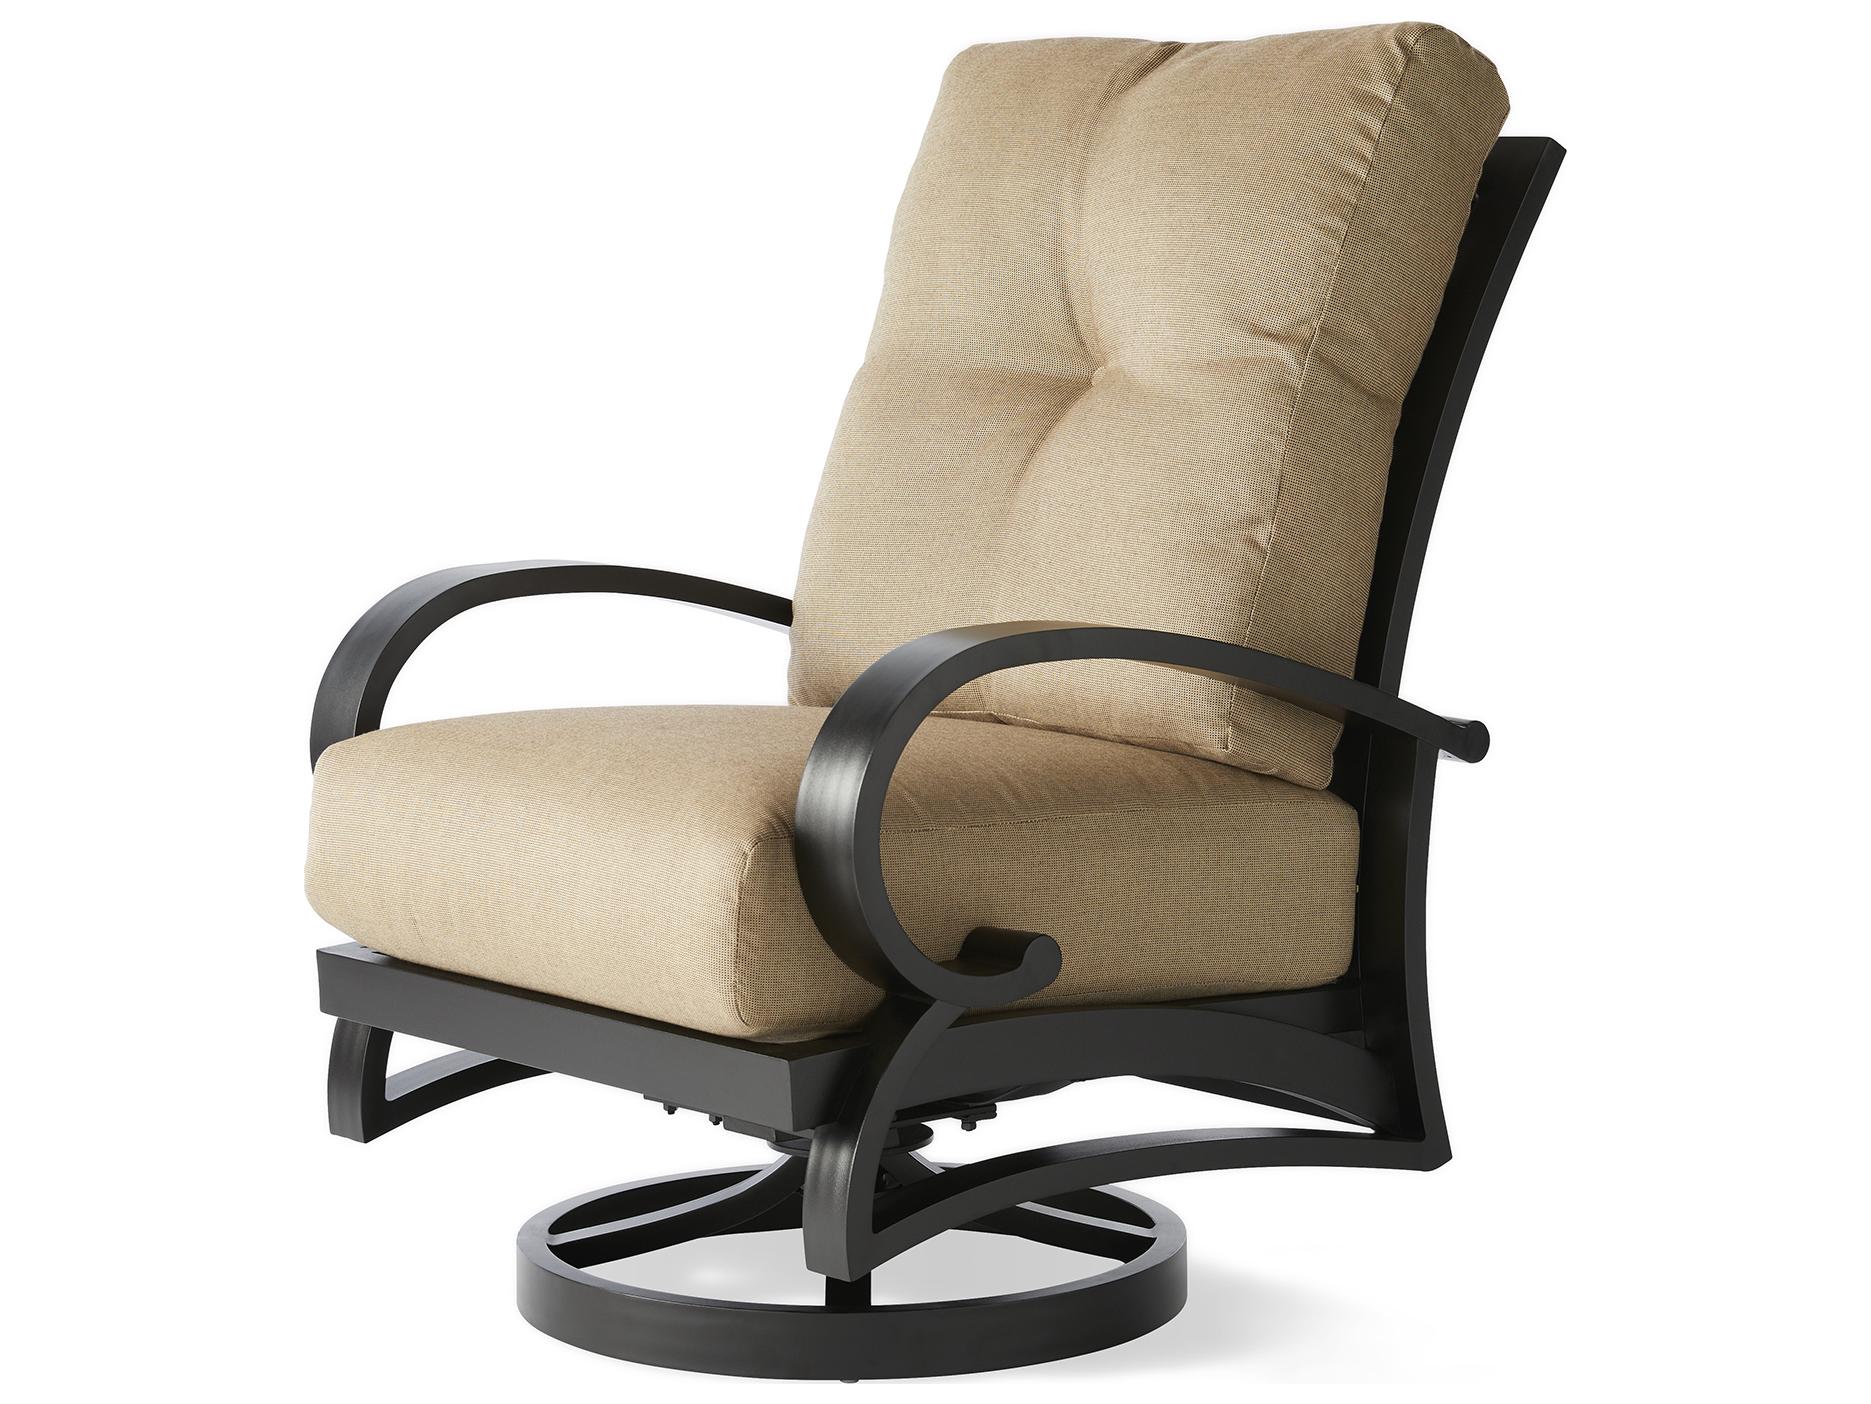 mallin salisbury cast aluminum swivel rocker lounge chair